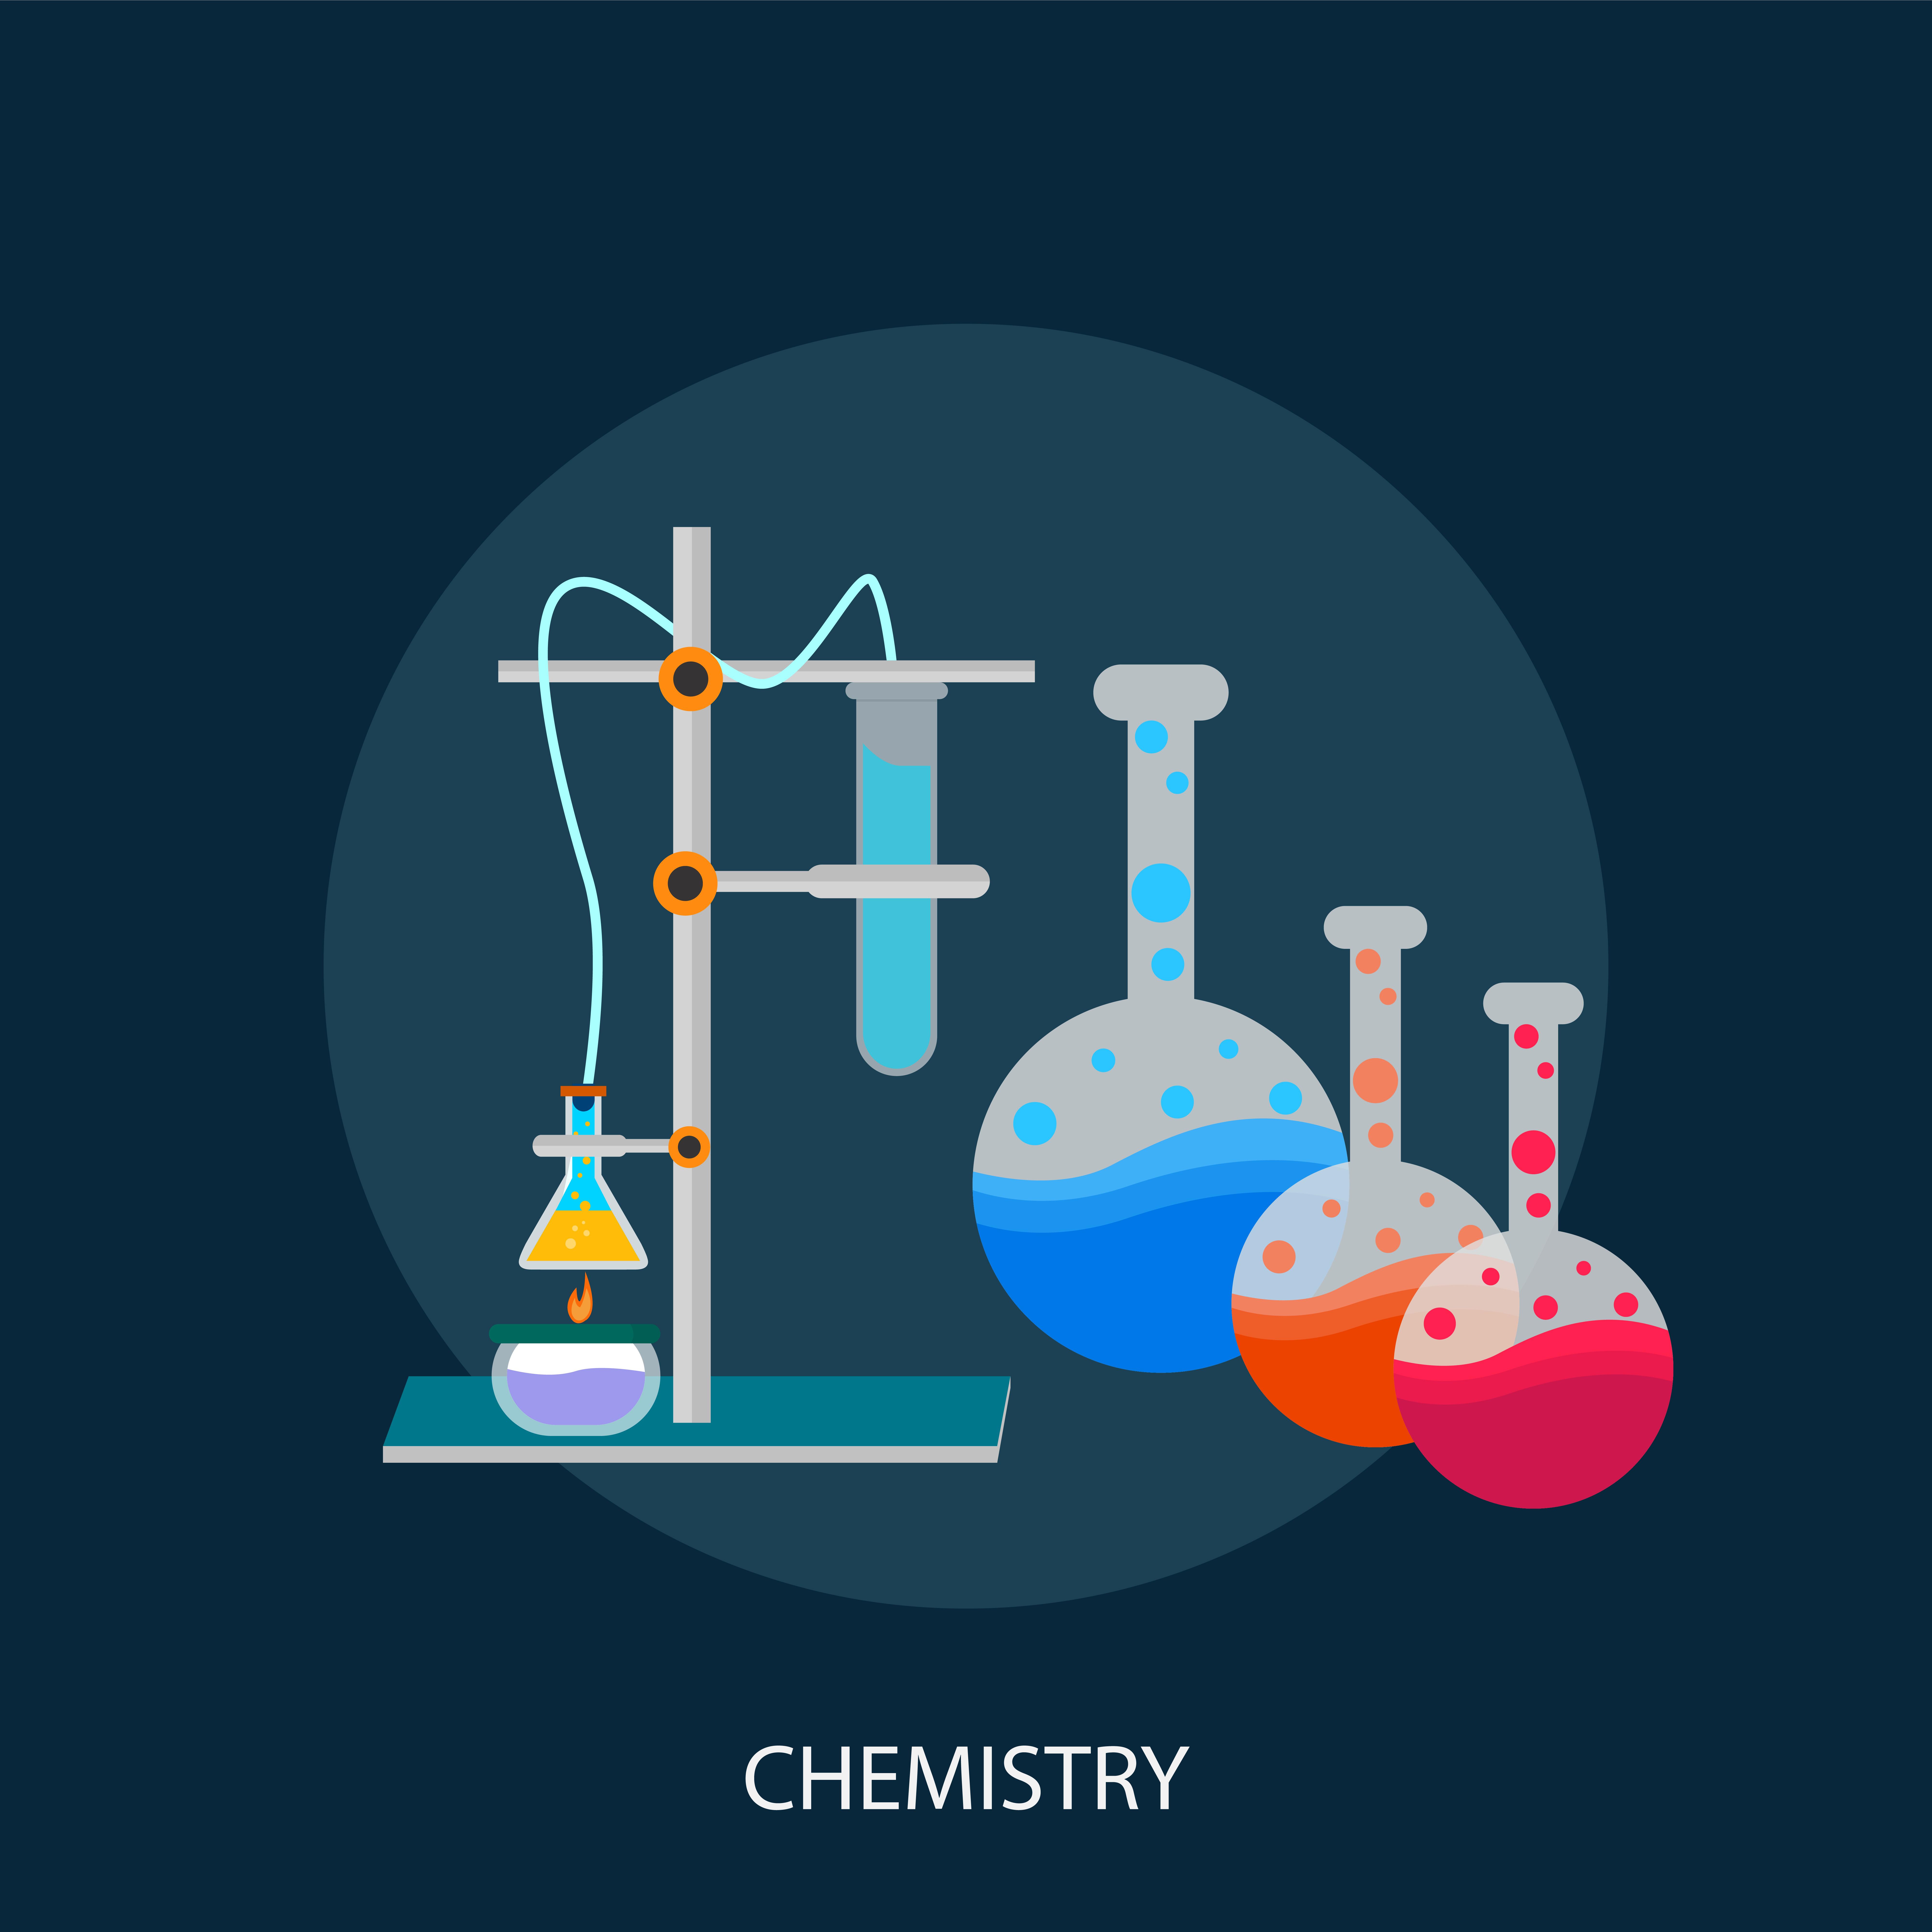 Science Laboratory Background Design: Chemistry Conceptual Illustration Design